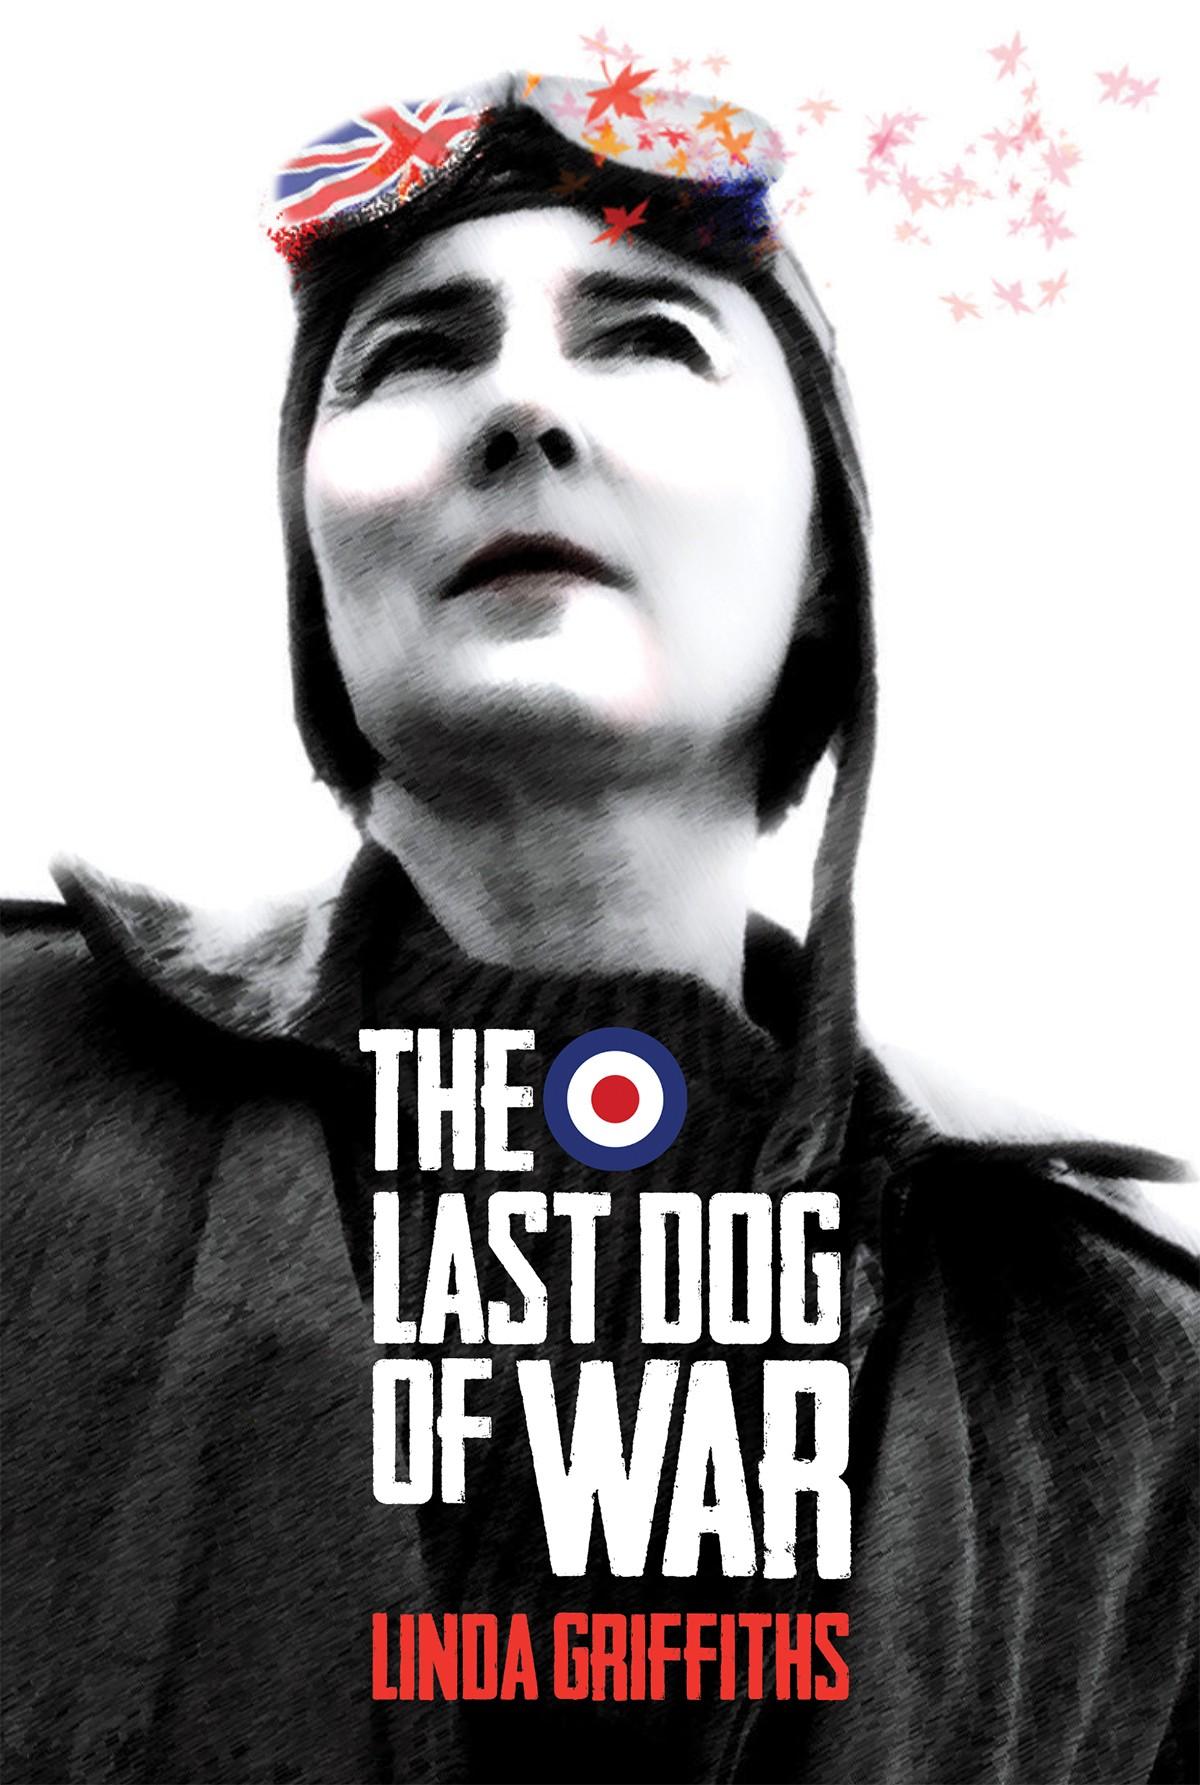 The Last Dog of War (ebook)